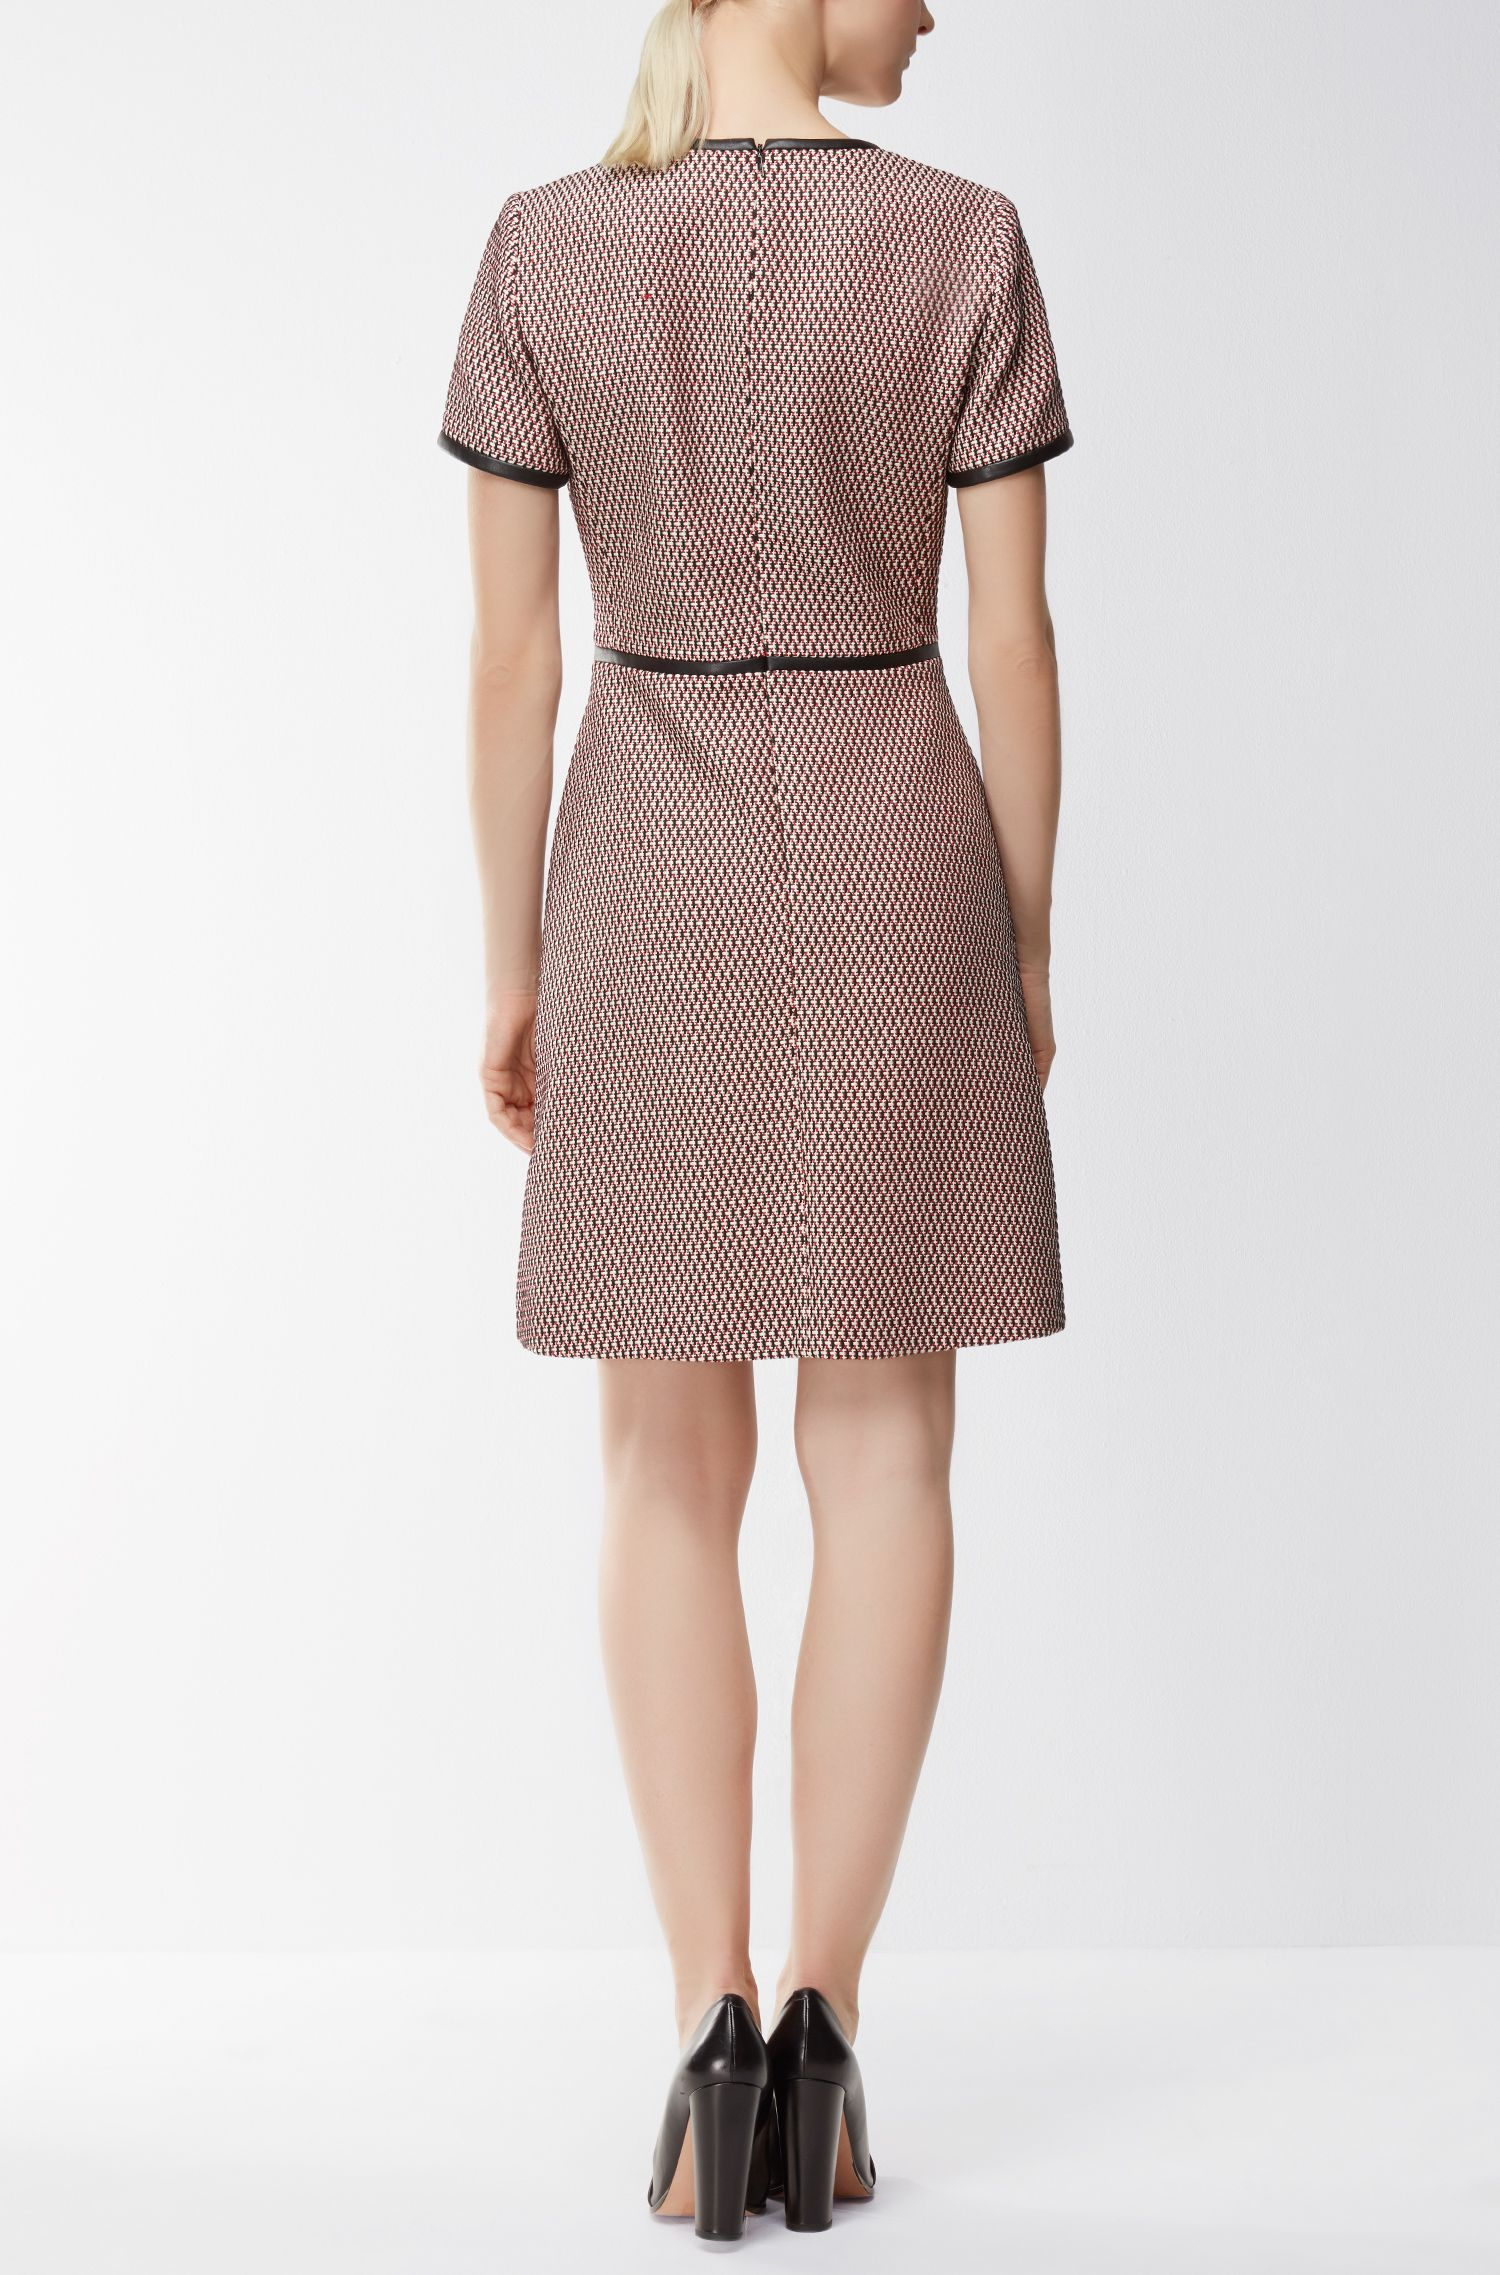 Dobby-Knit Cotton Blend Dress | Dagardi